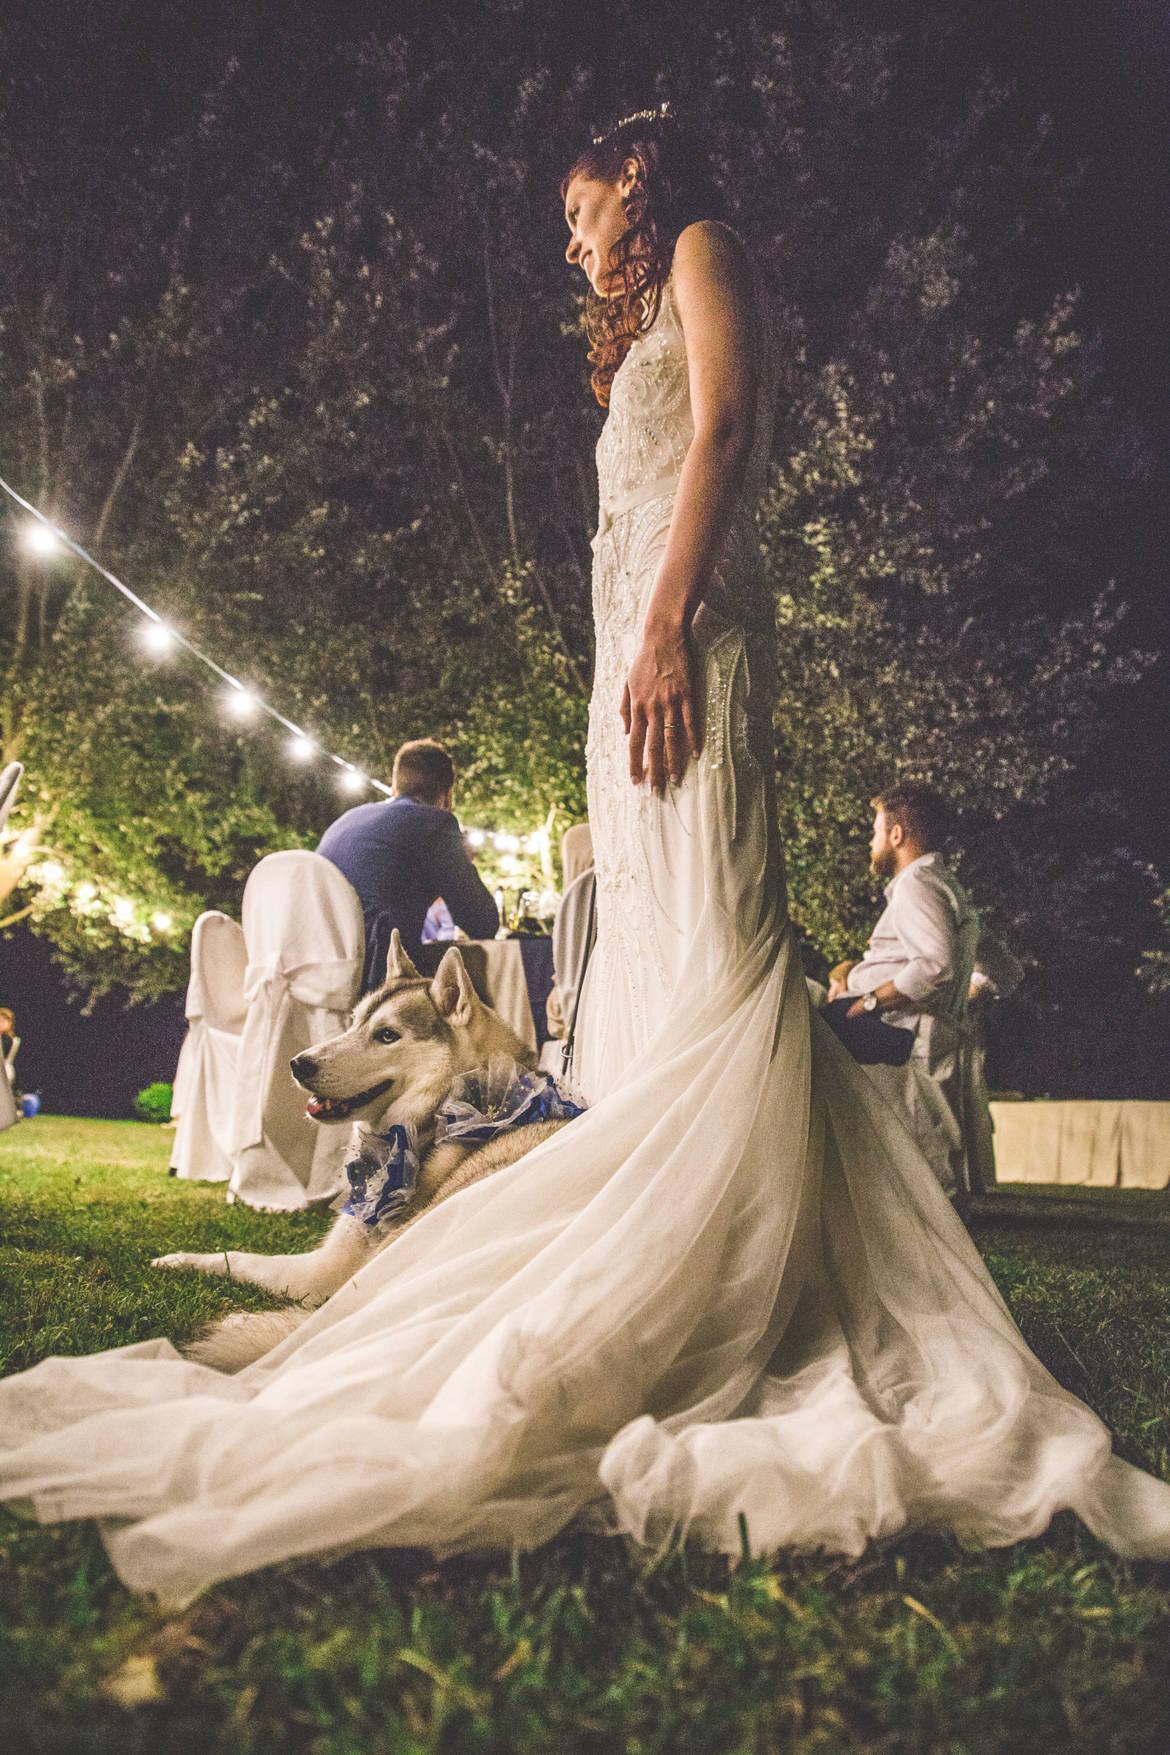 Matrimonio-Enrico-e-Mirna-29.jpg